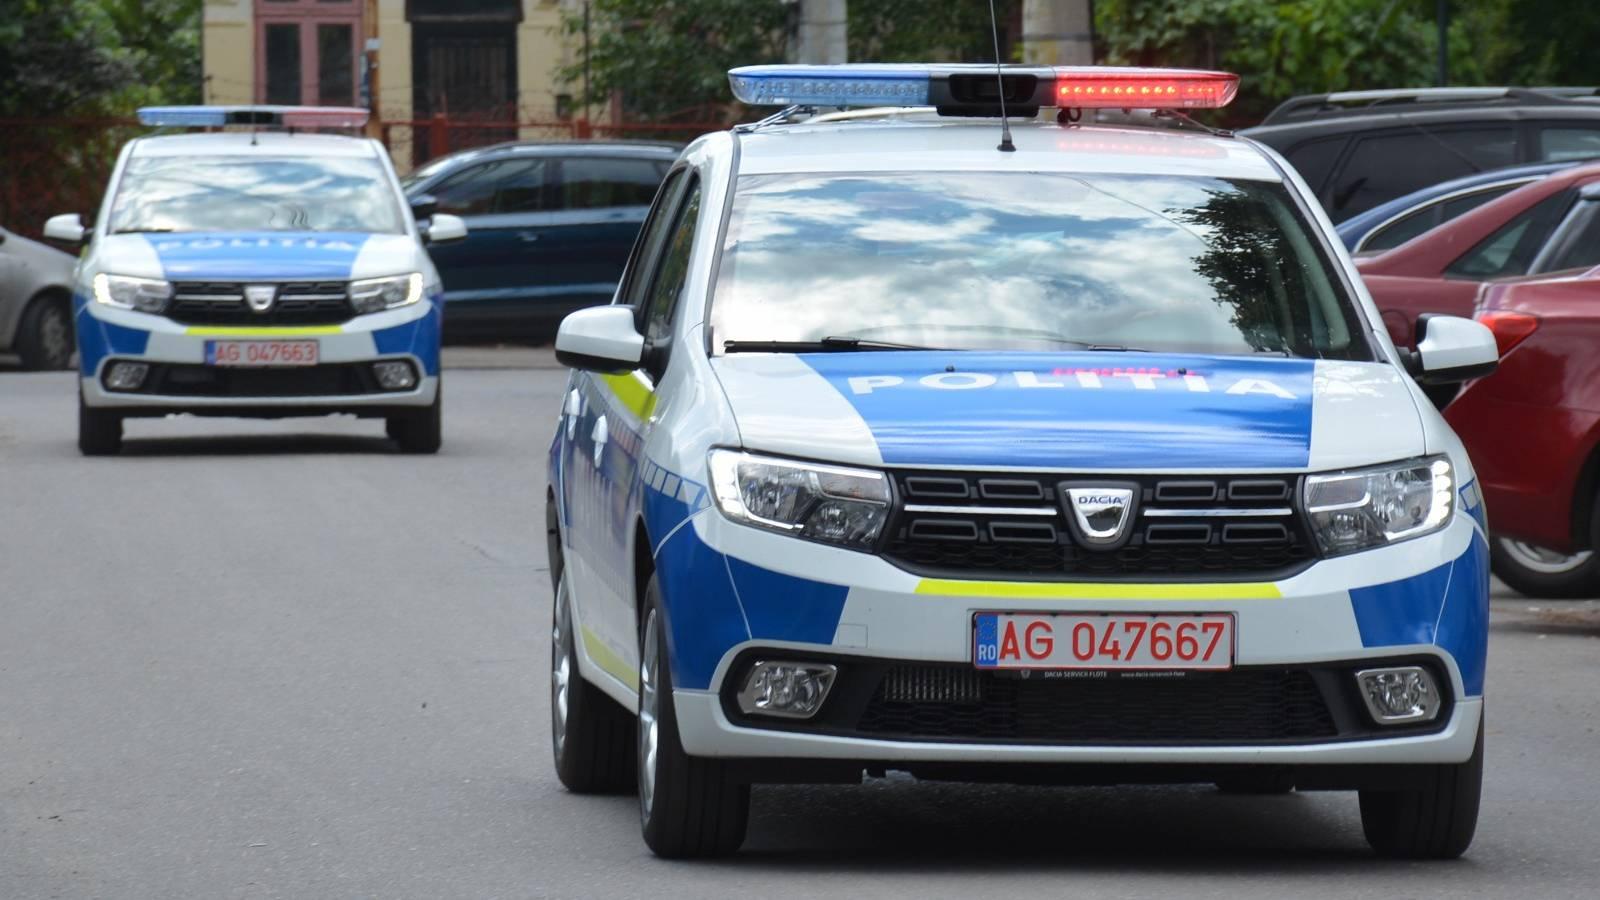 politia romana alerta lovire copii